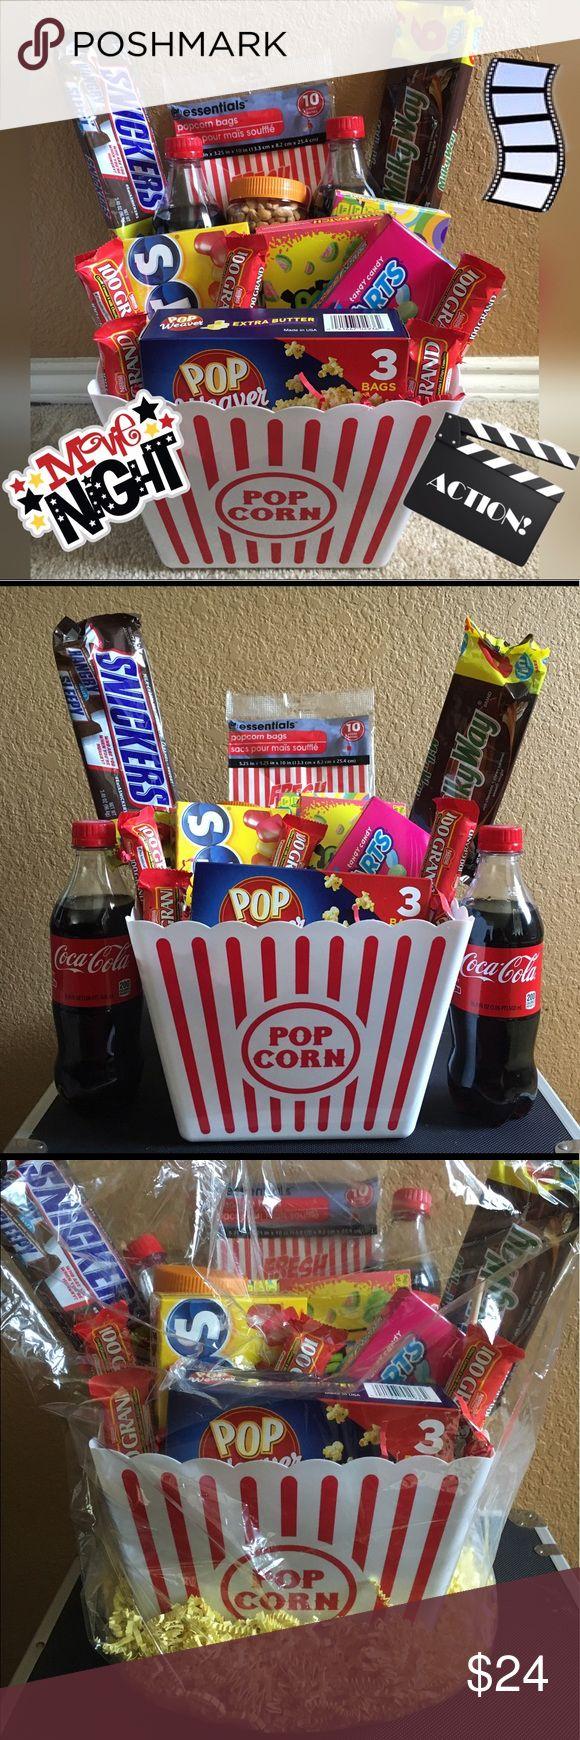 25 unique Popcorn gift baskets ideas on Pinterest Movie